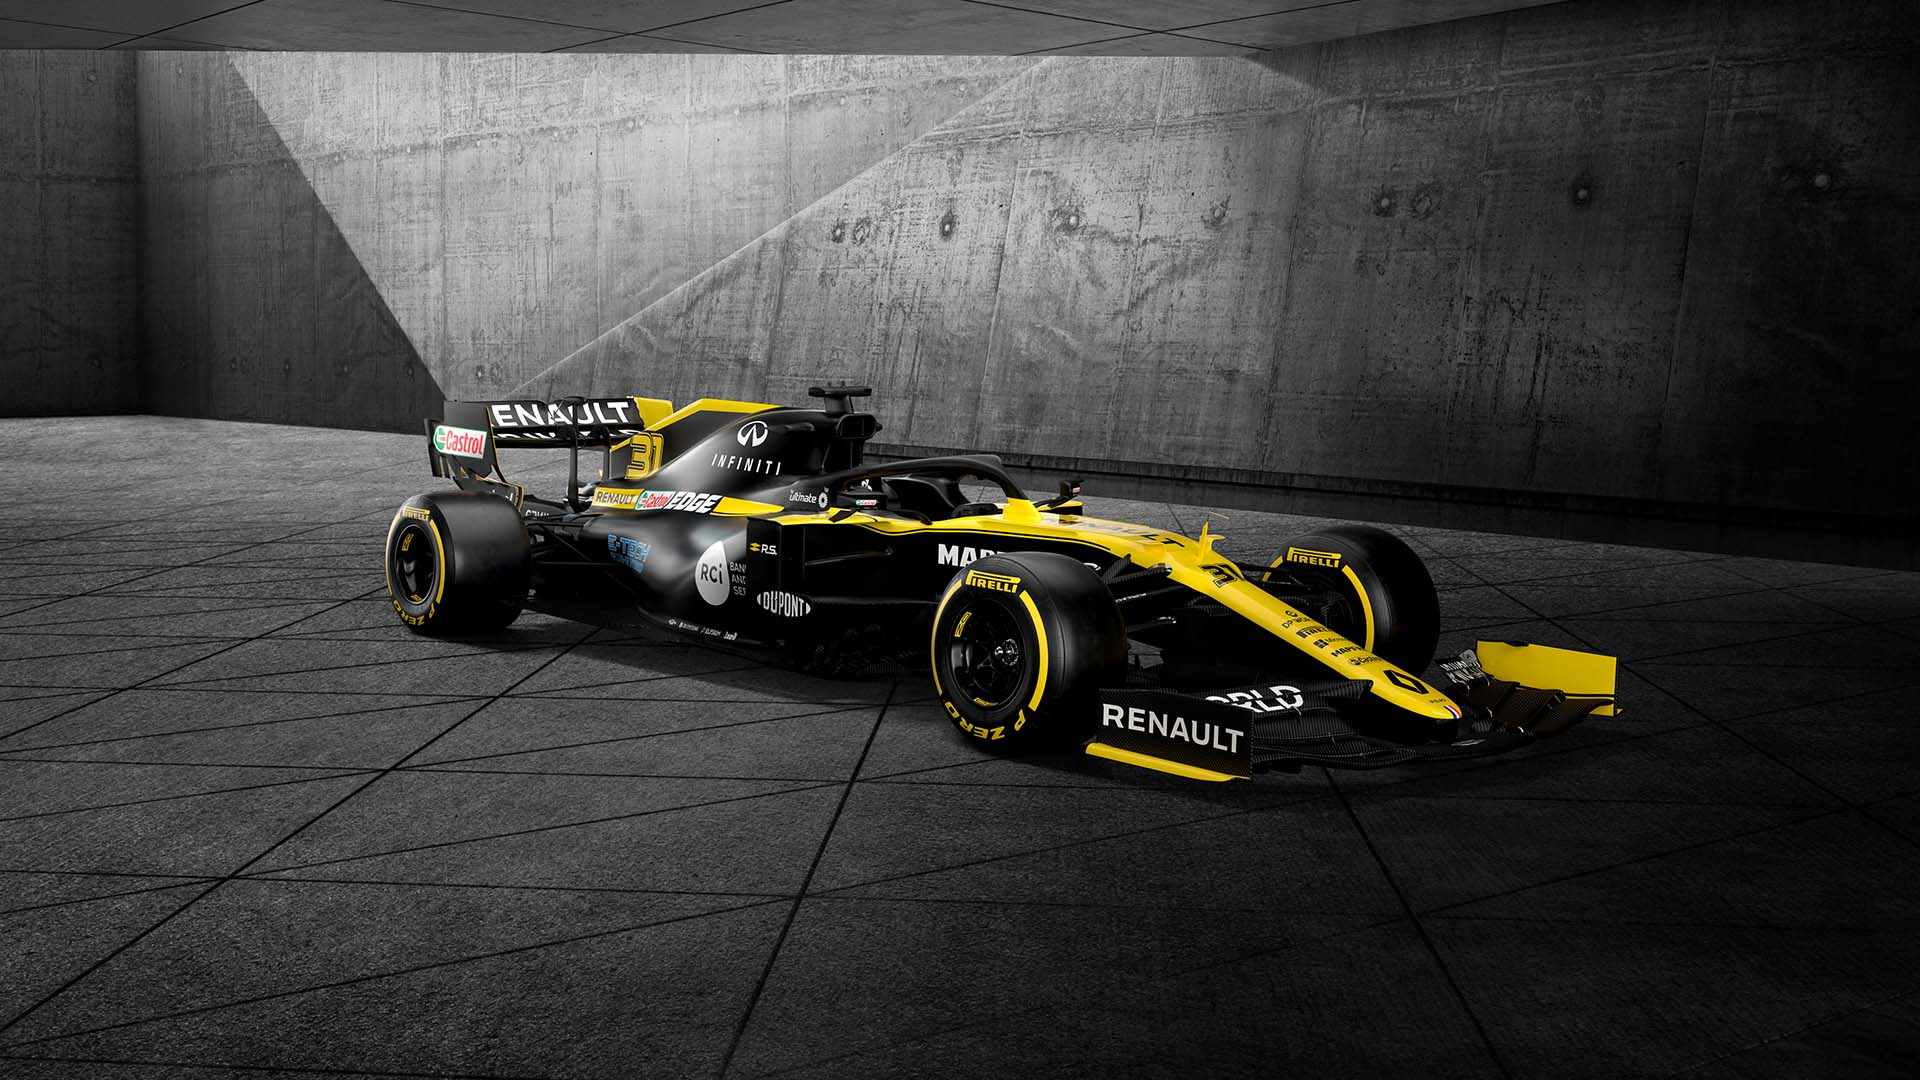 Renault last team to launch livery ahead of Australian Grand Prix ...